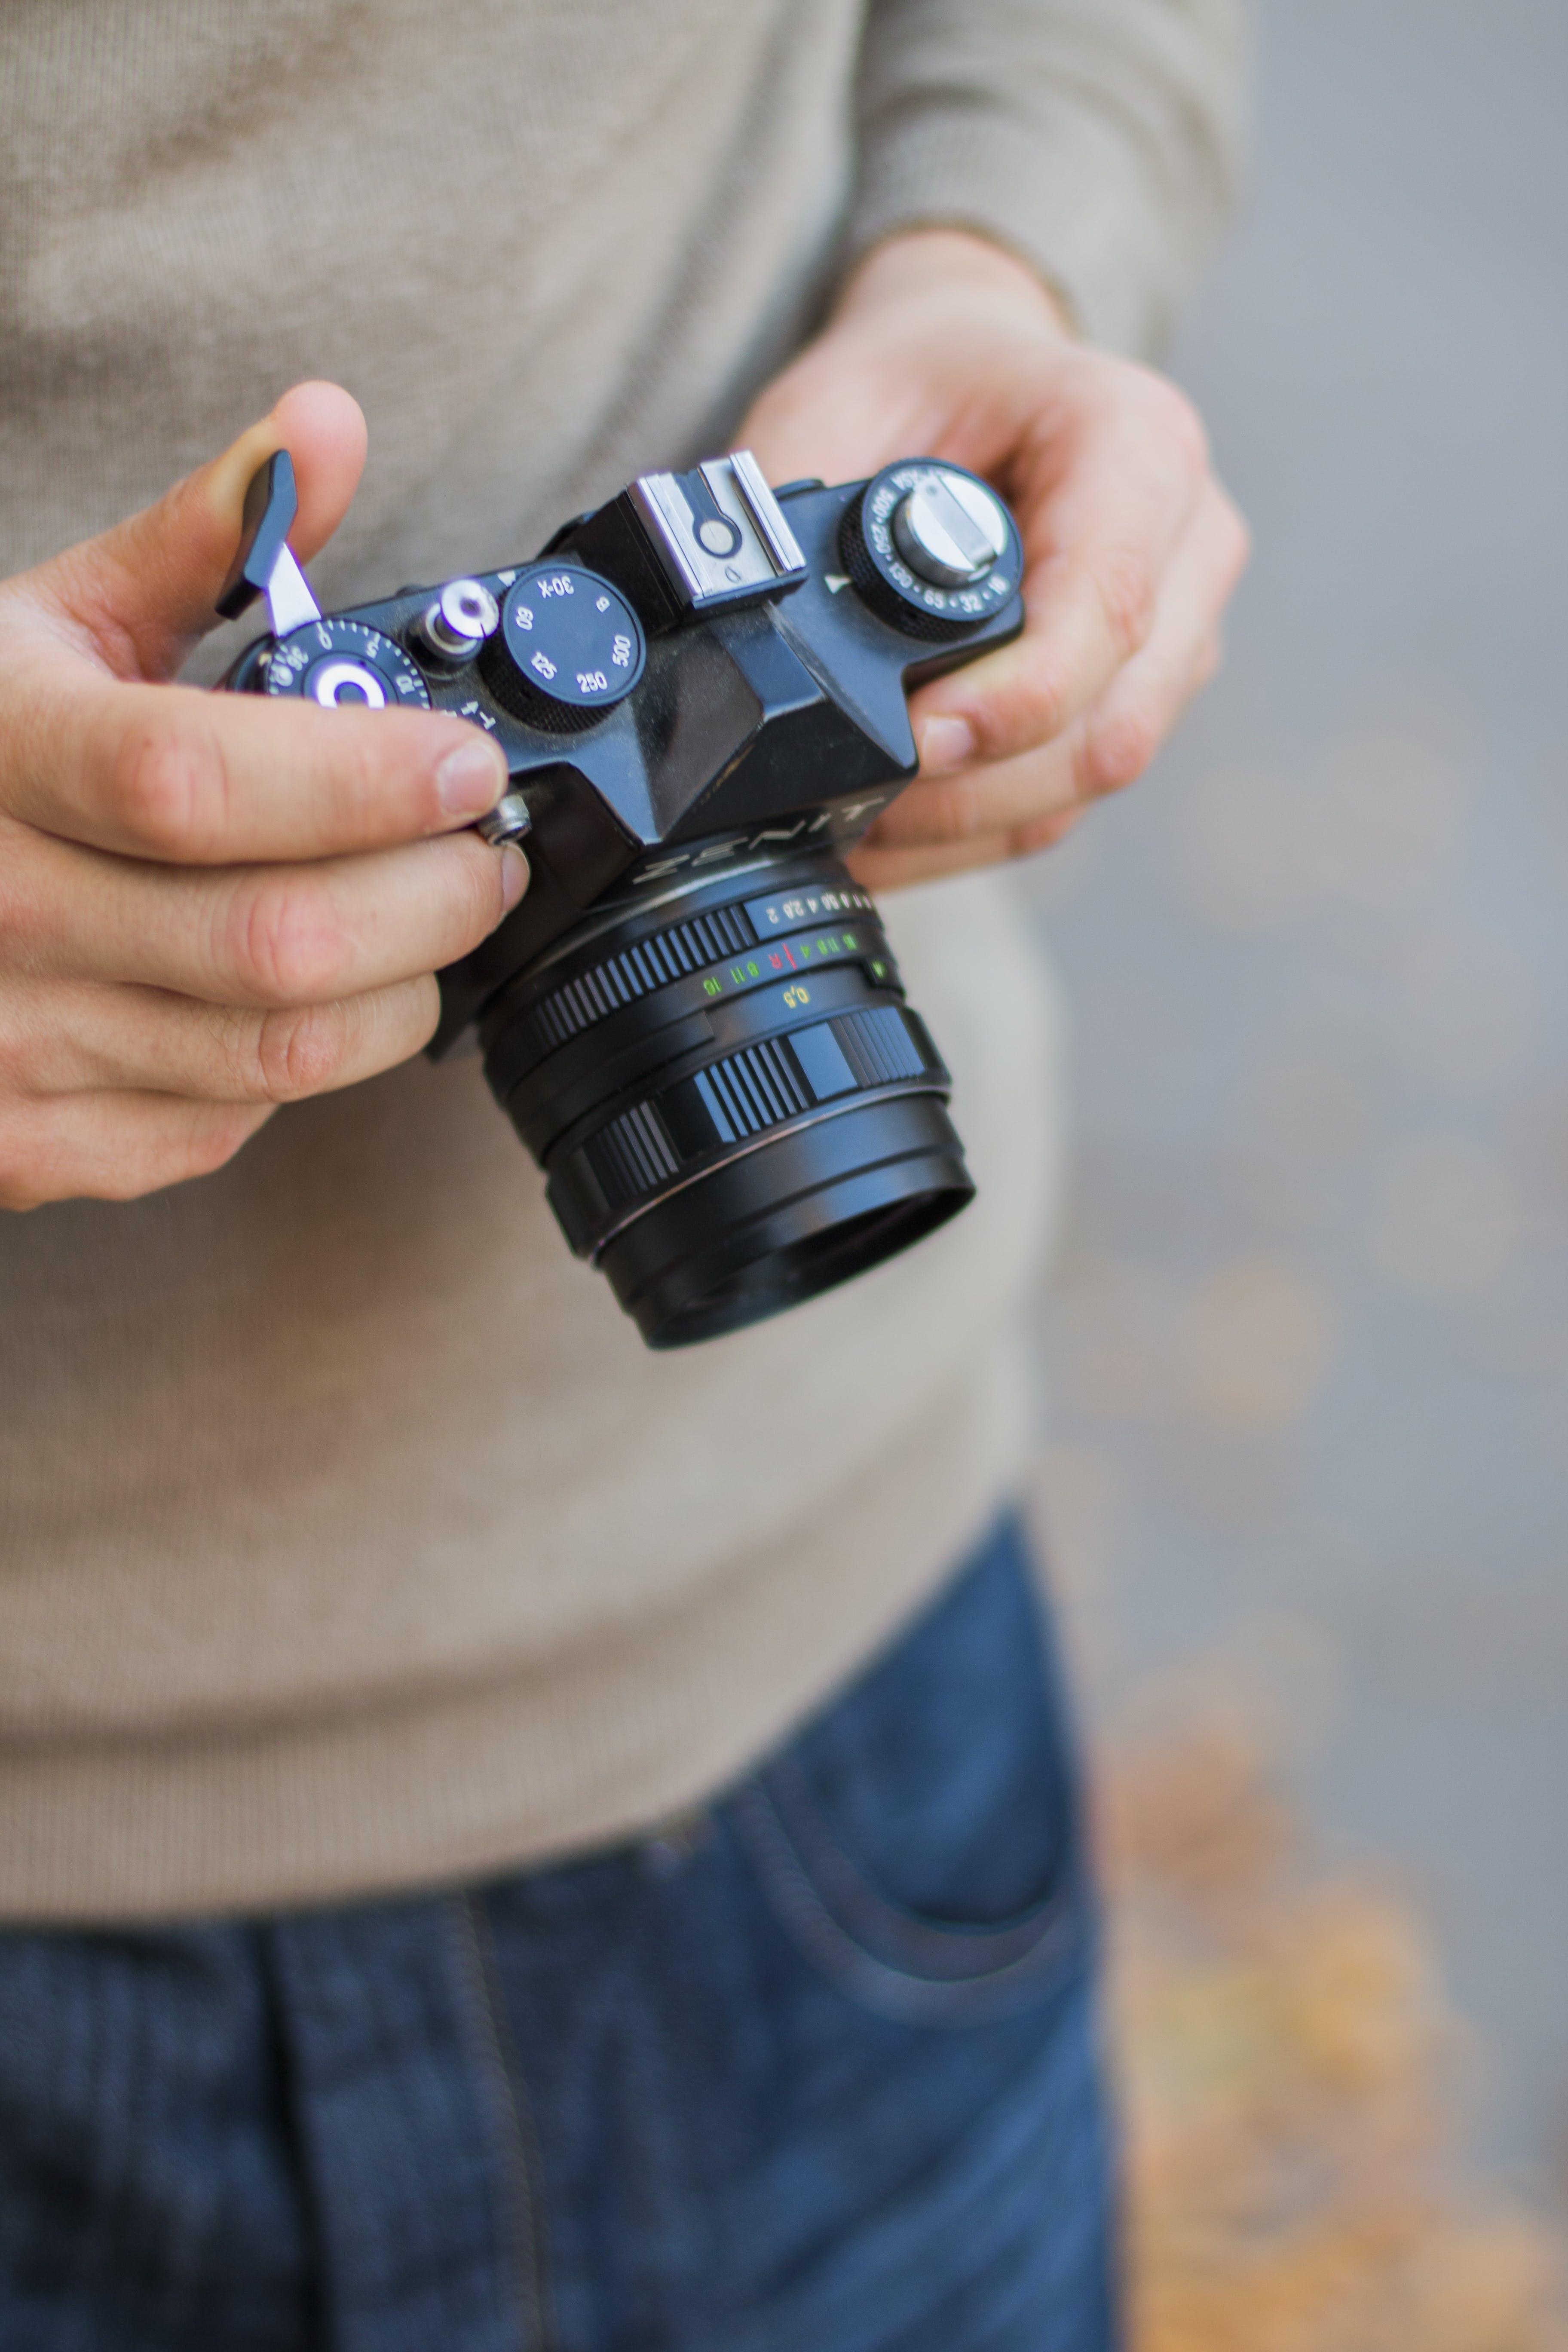 analog camera, camera, dslr